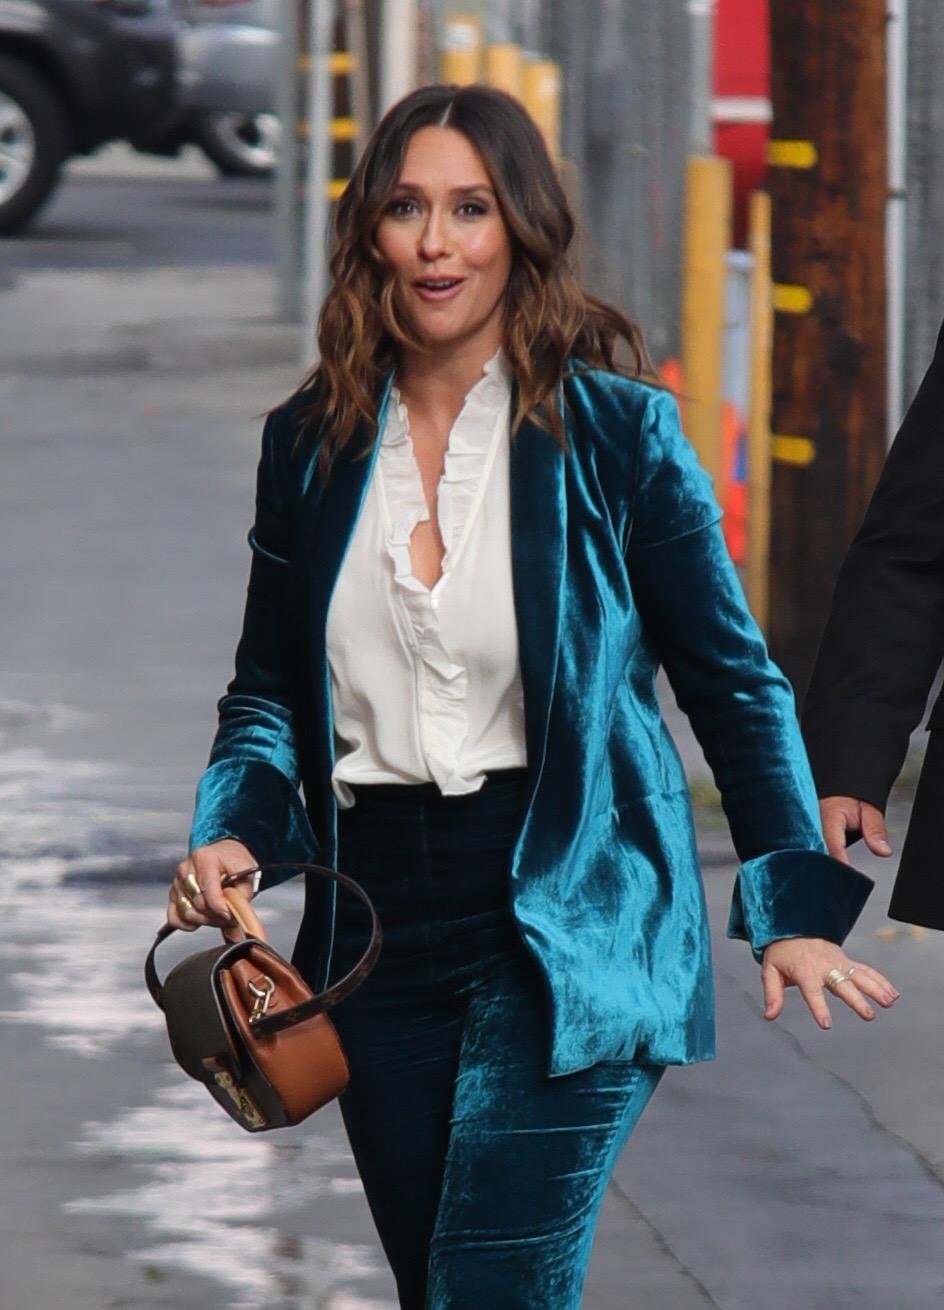 Jennifer Love Hewitt - Arrives at 'Jimmy Kimmel Live' in Hollywood